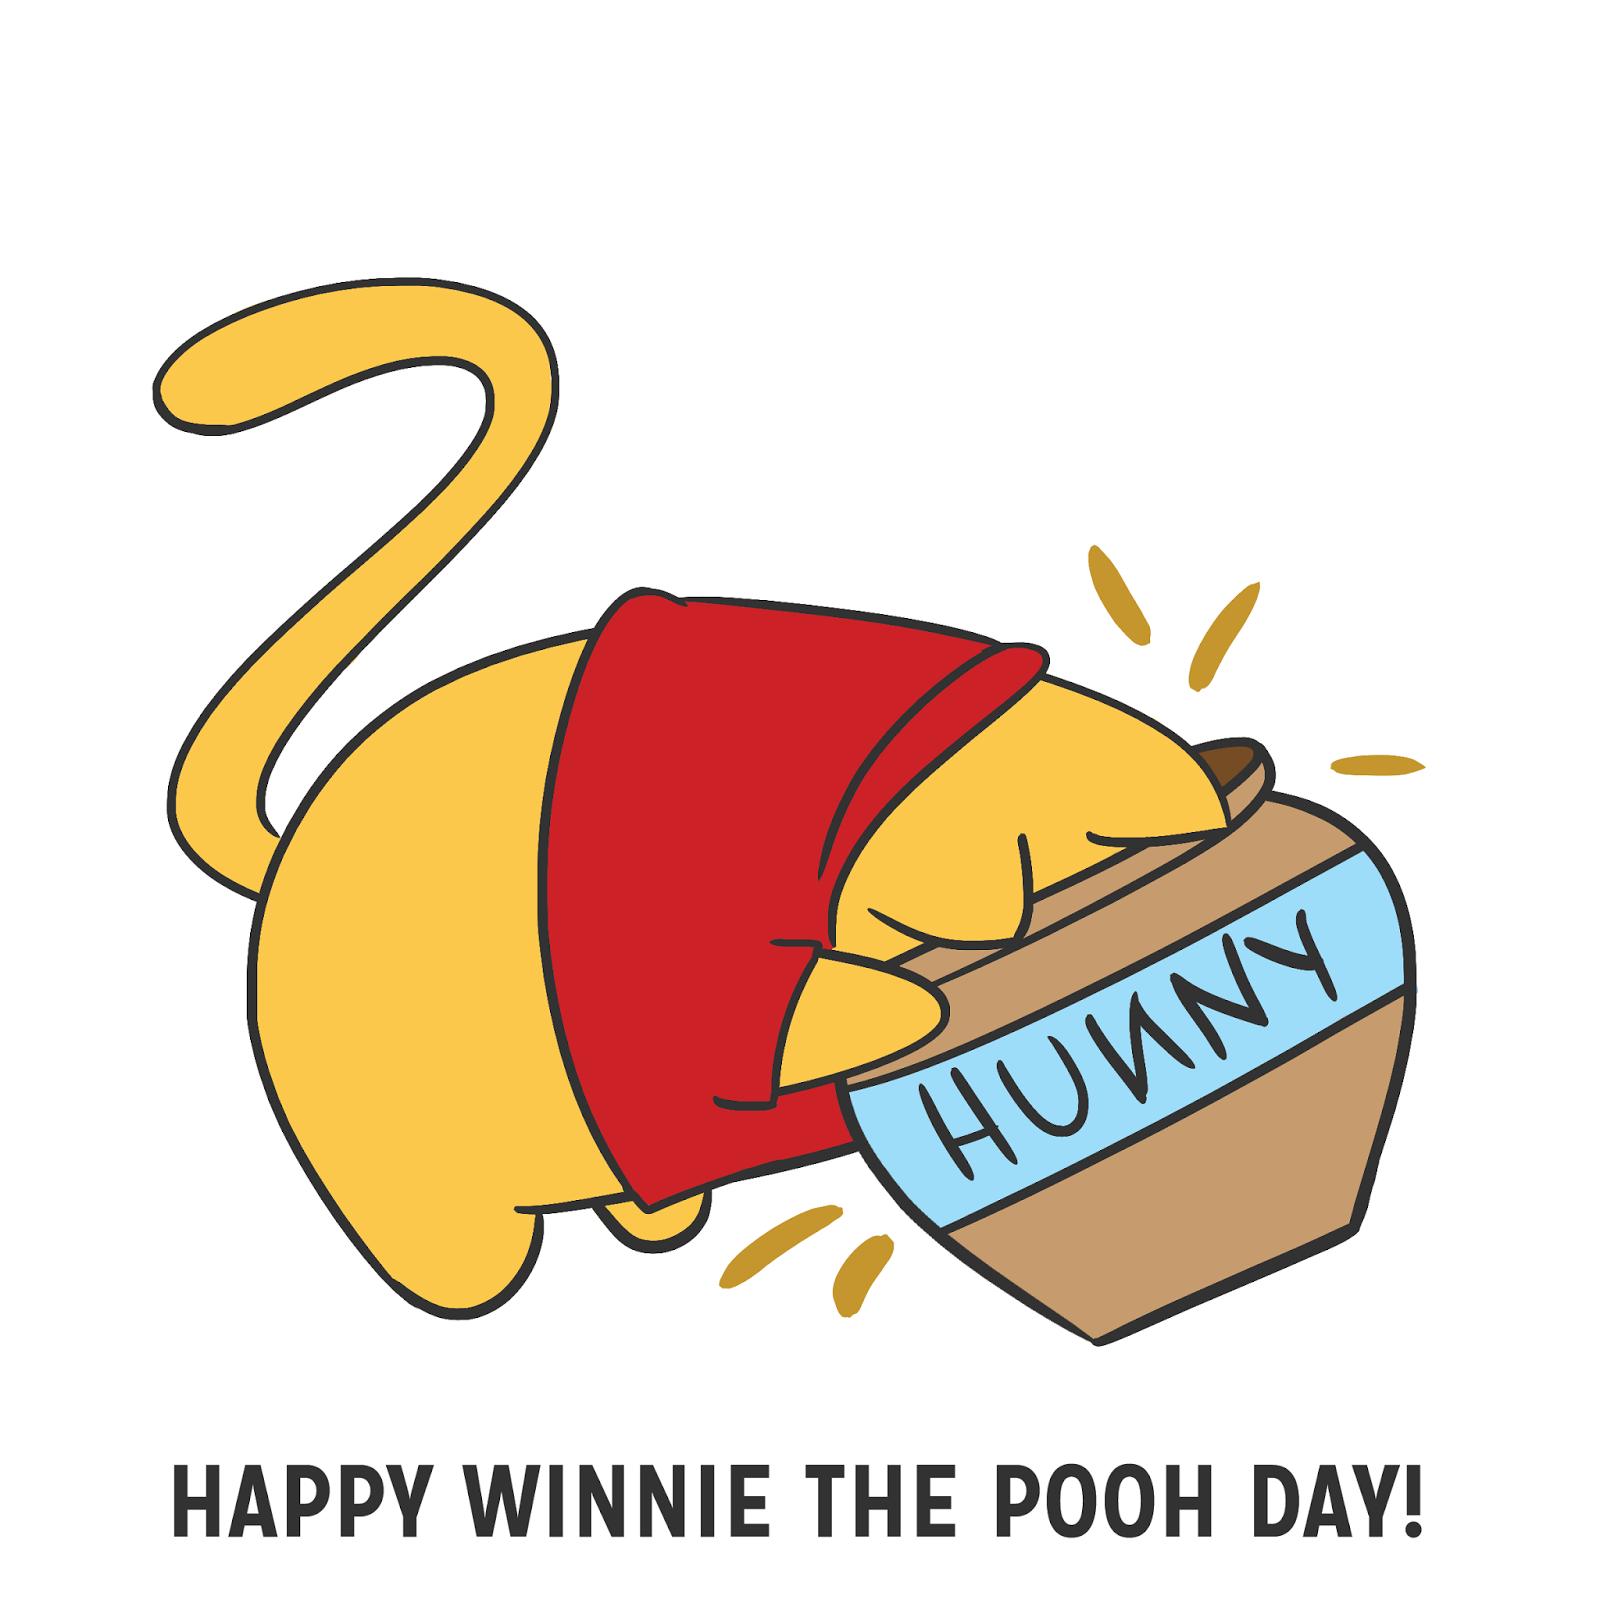 the pink samurai january 18 u2022 happy winnie the pooh day winnie rh pinterest com Independence Day Winnie the Pooh Vintage Winnie the Pooh Clip Art